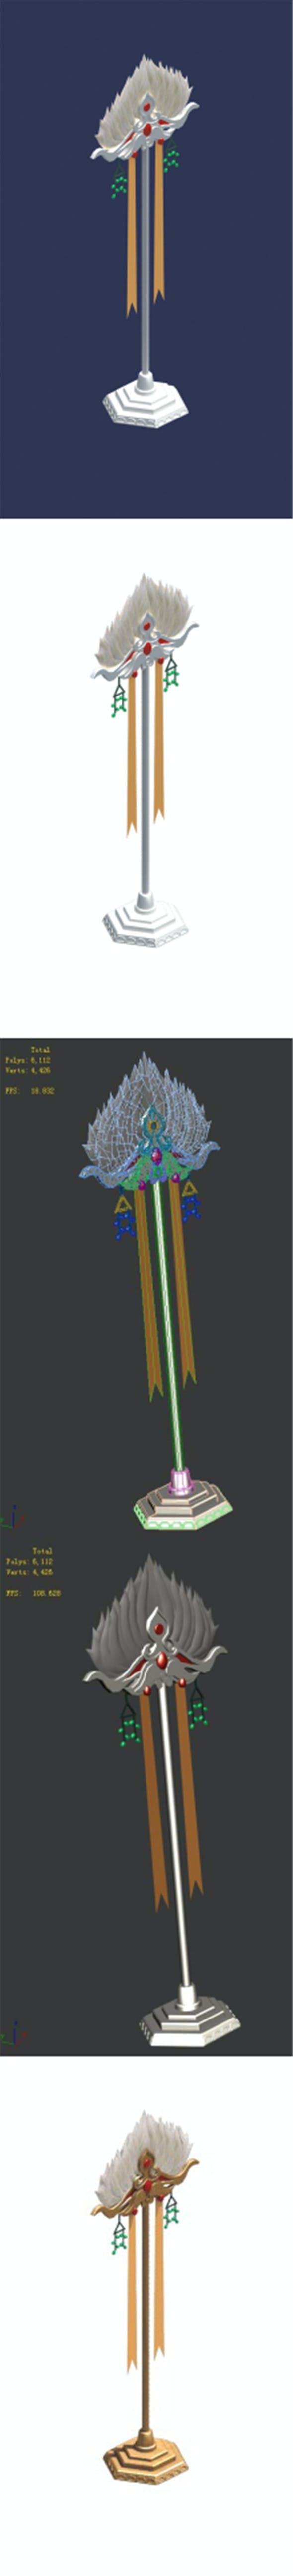 Palace - decorative fan - 3DOcean Item for Sale